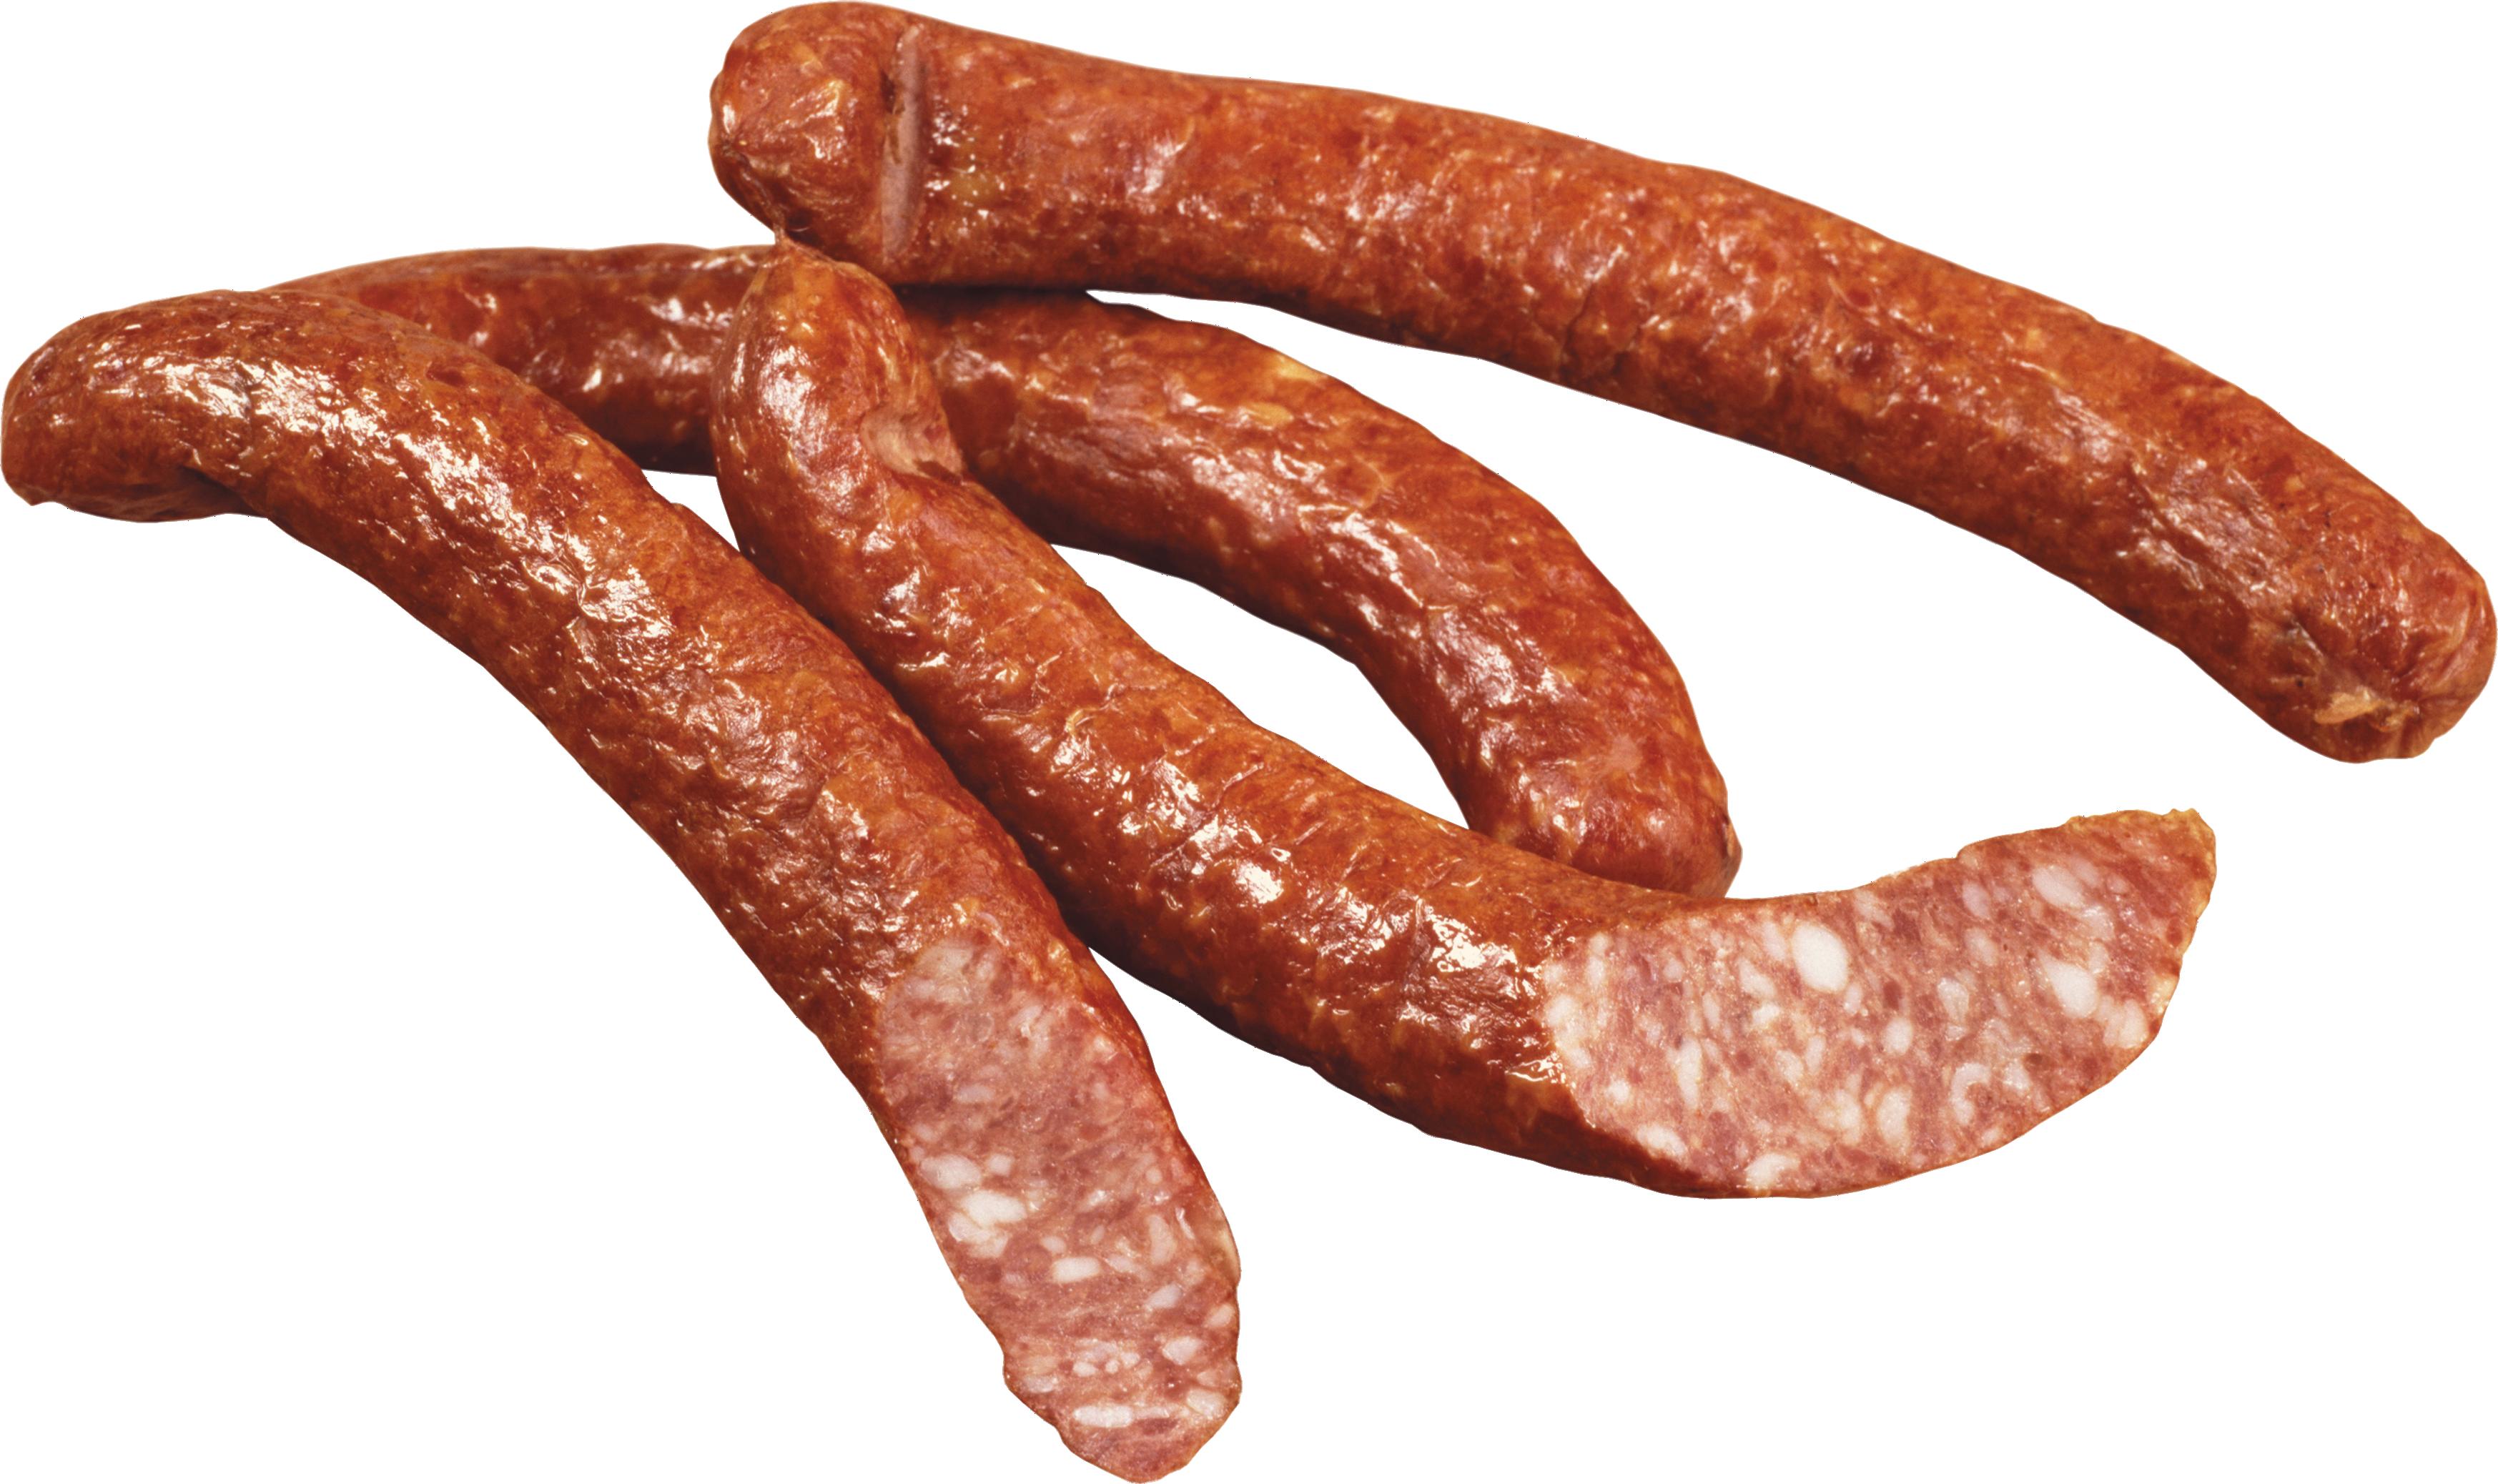 Sausage PNG - 27420